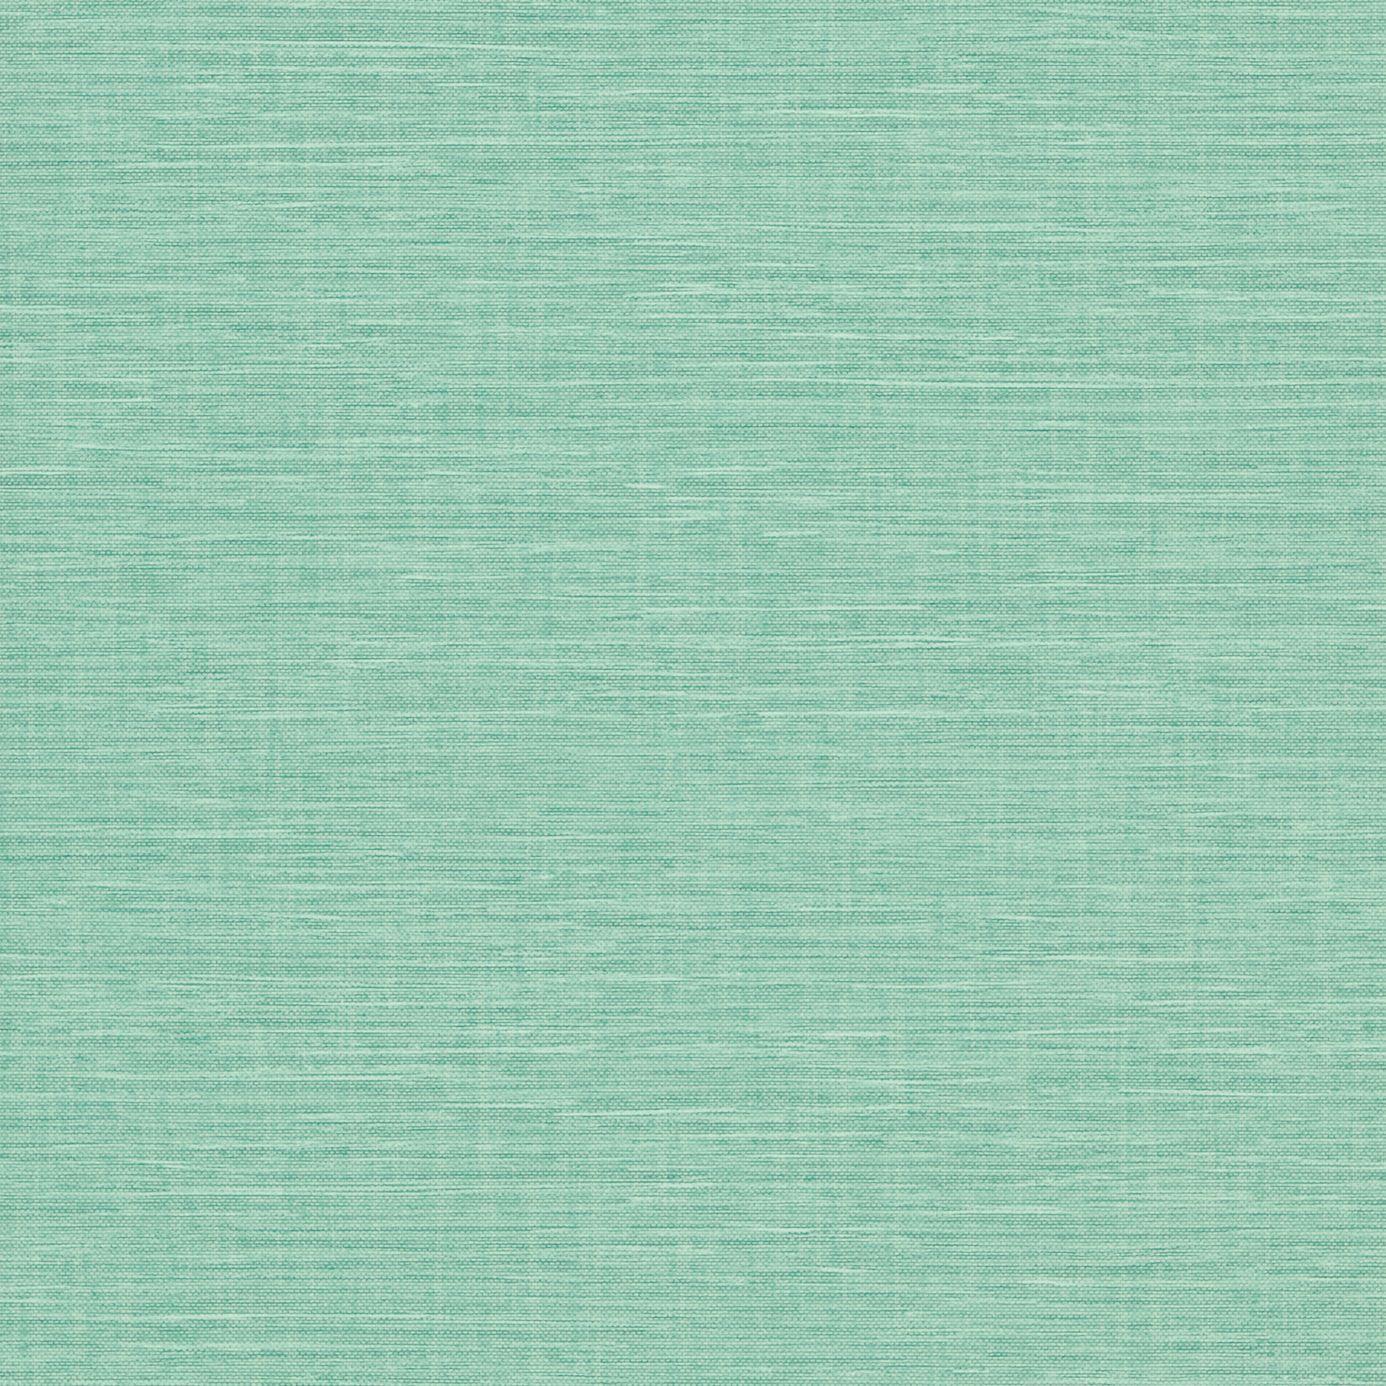 Sefa Wallpaper Turquoise 110327 Harlequin Folia